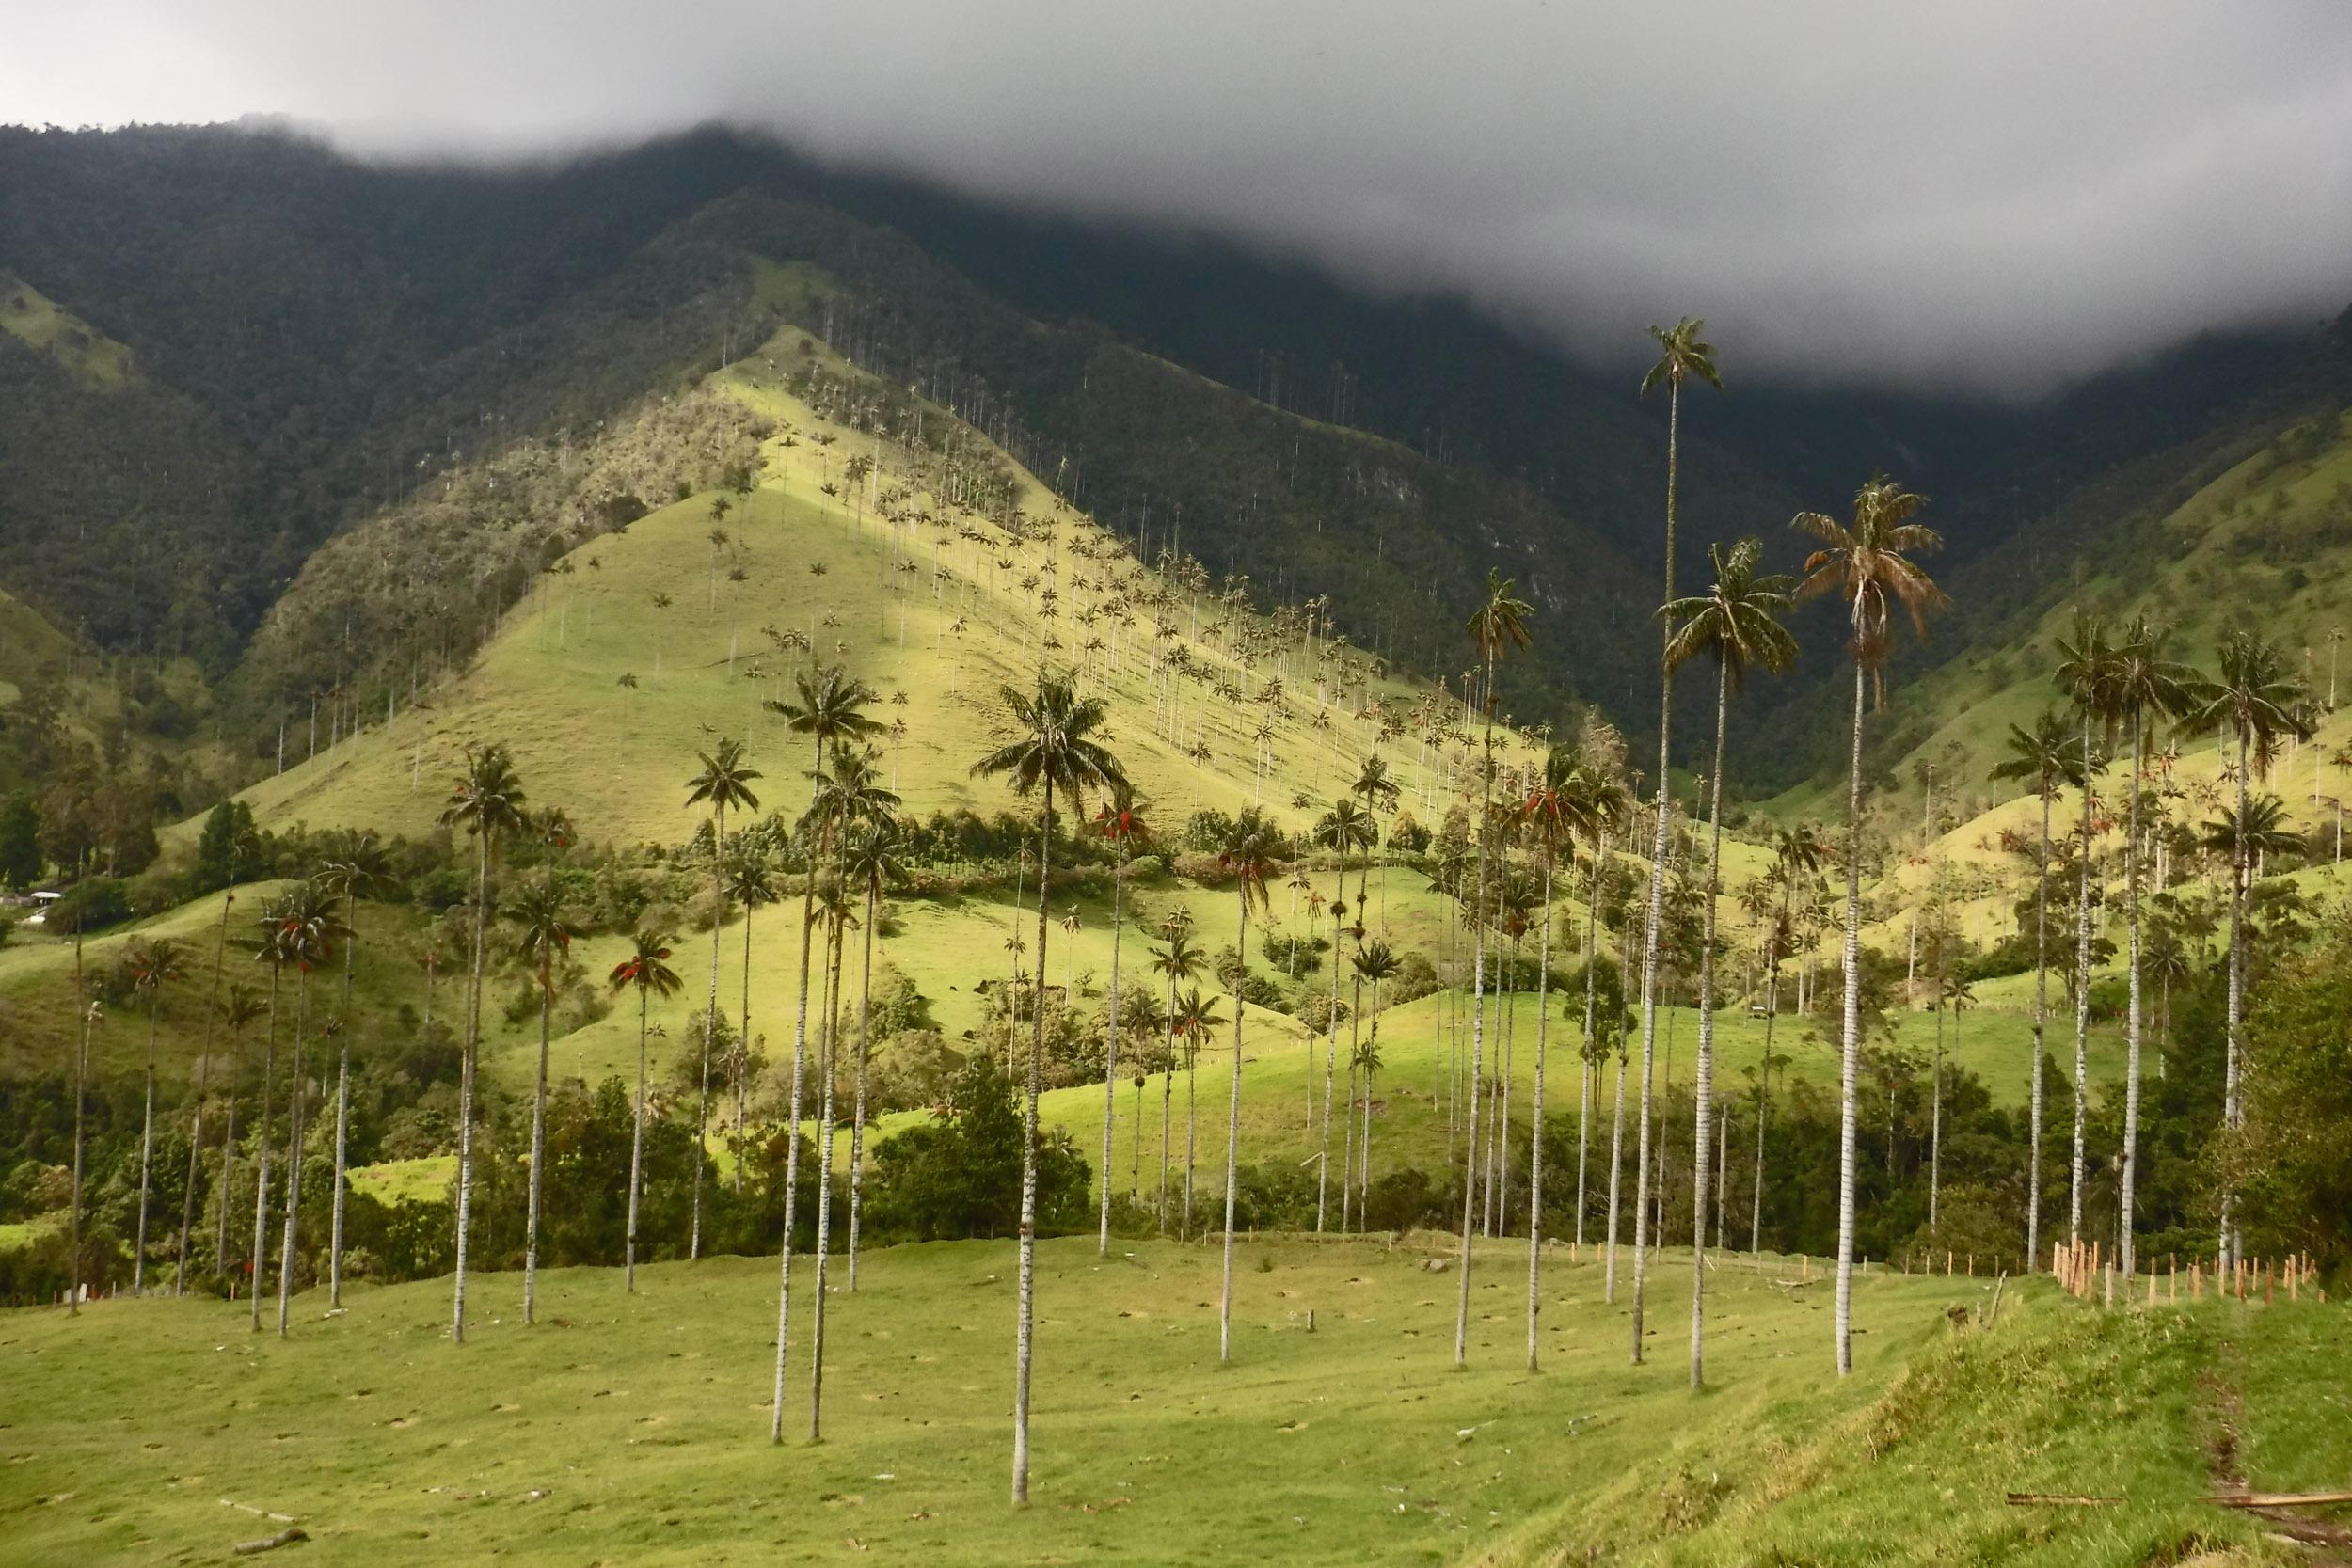 Colombia Valle De Cocora2.katka